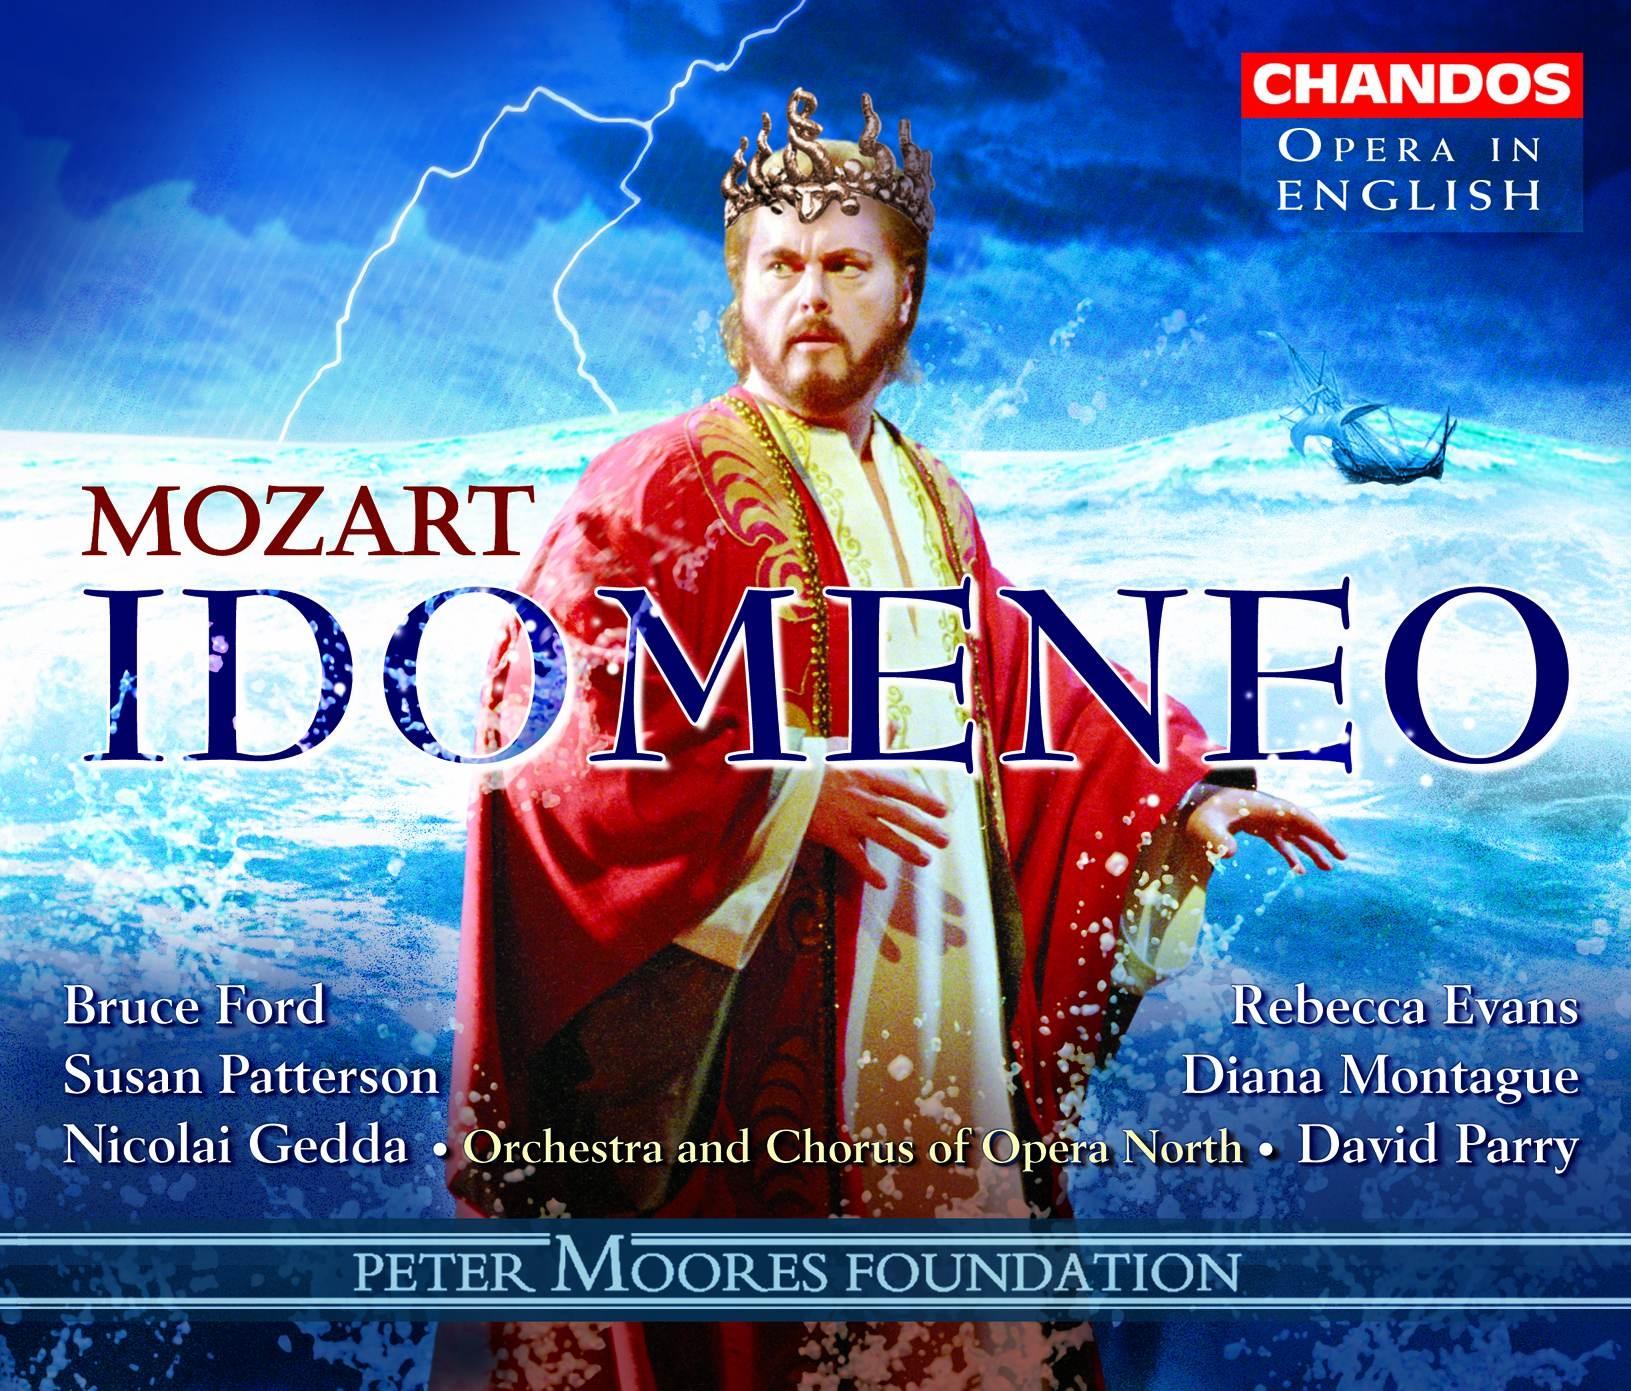 Mozart Idomeneo Vocal Amp Song Opera In English Opera In